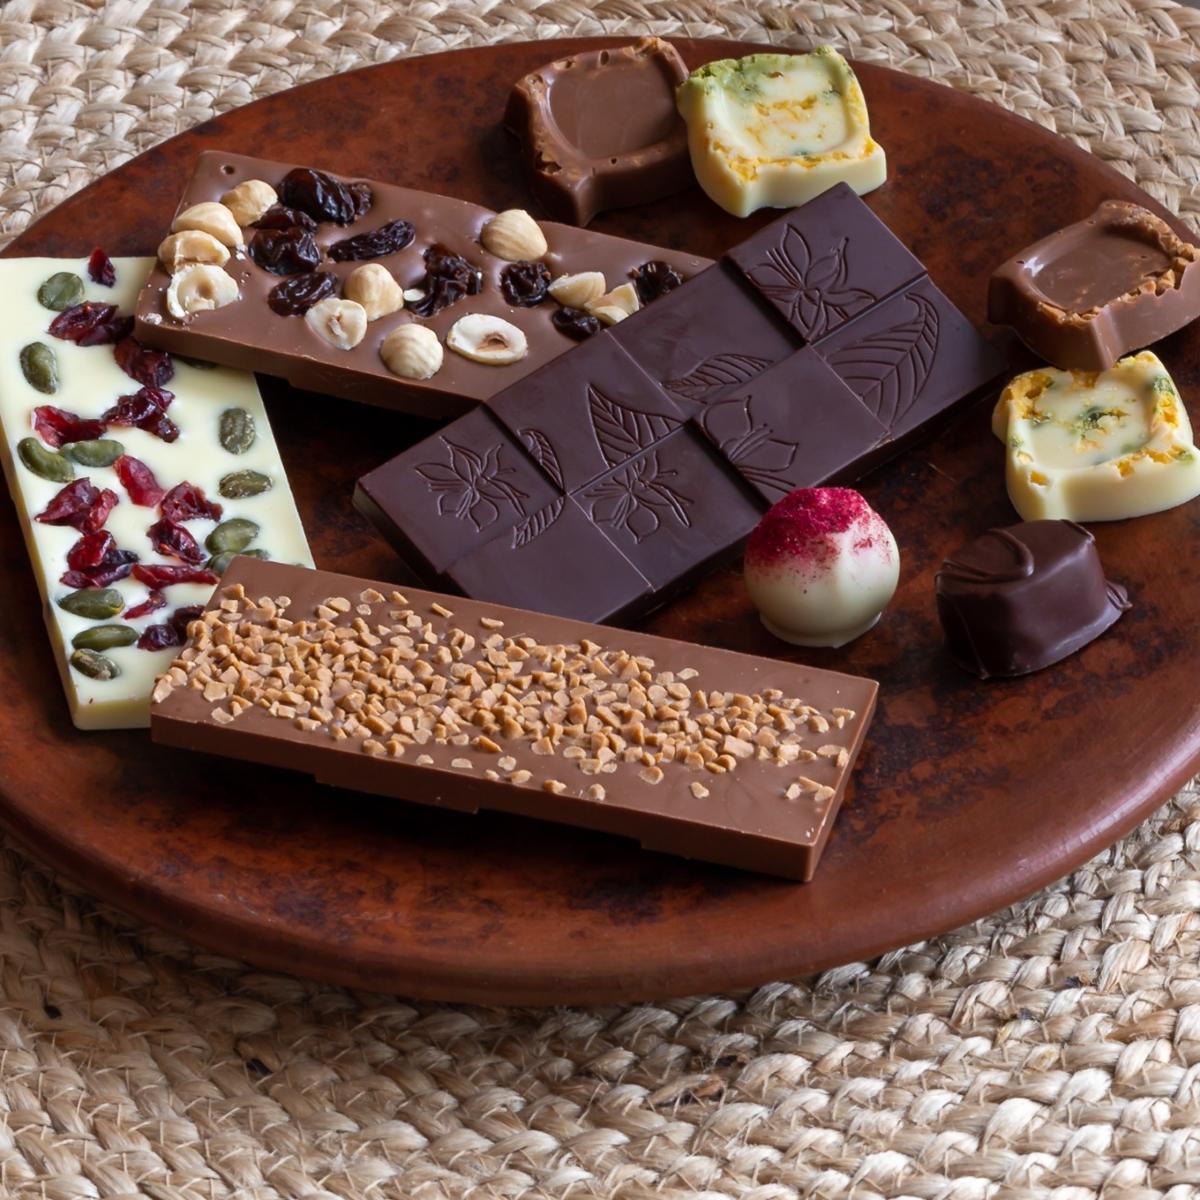 Alida Marstrand Schokoladengeschäft Kopenhagen